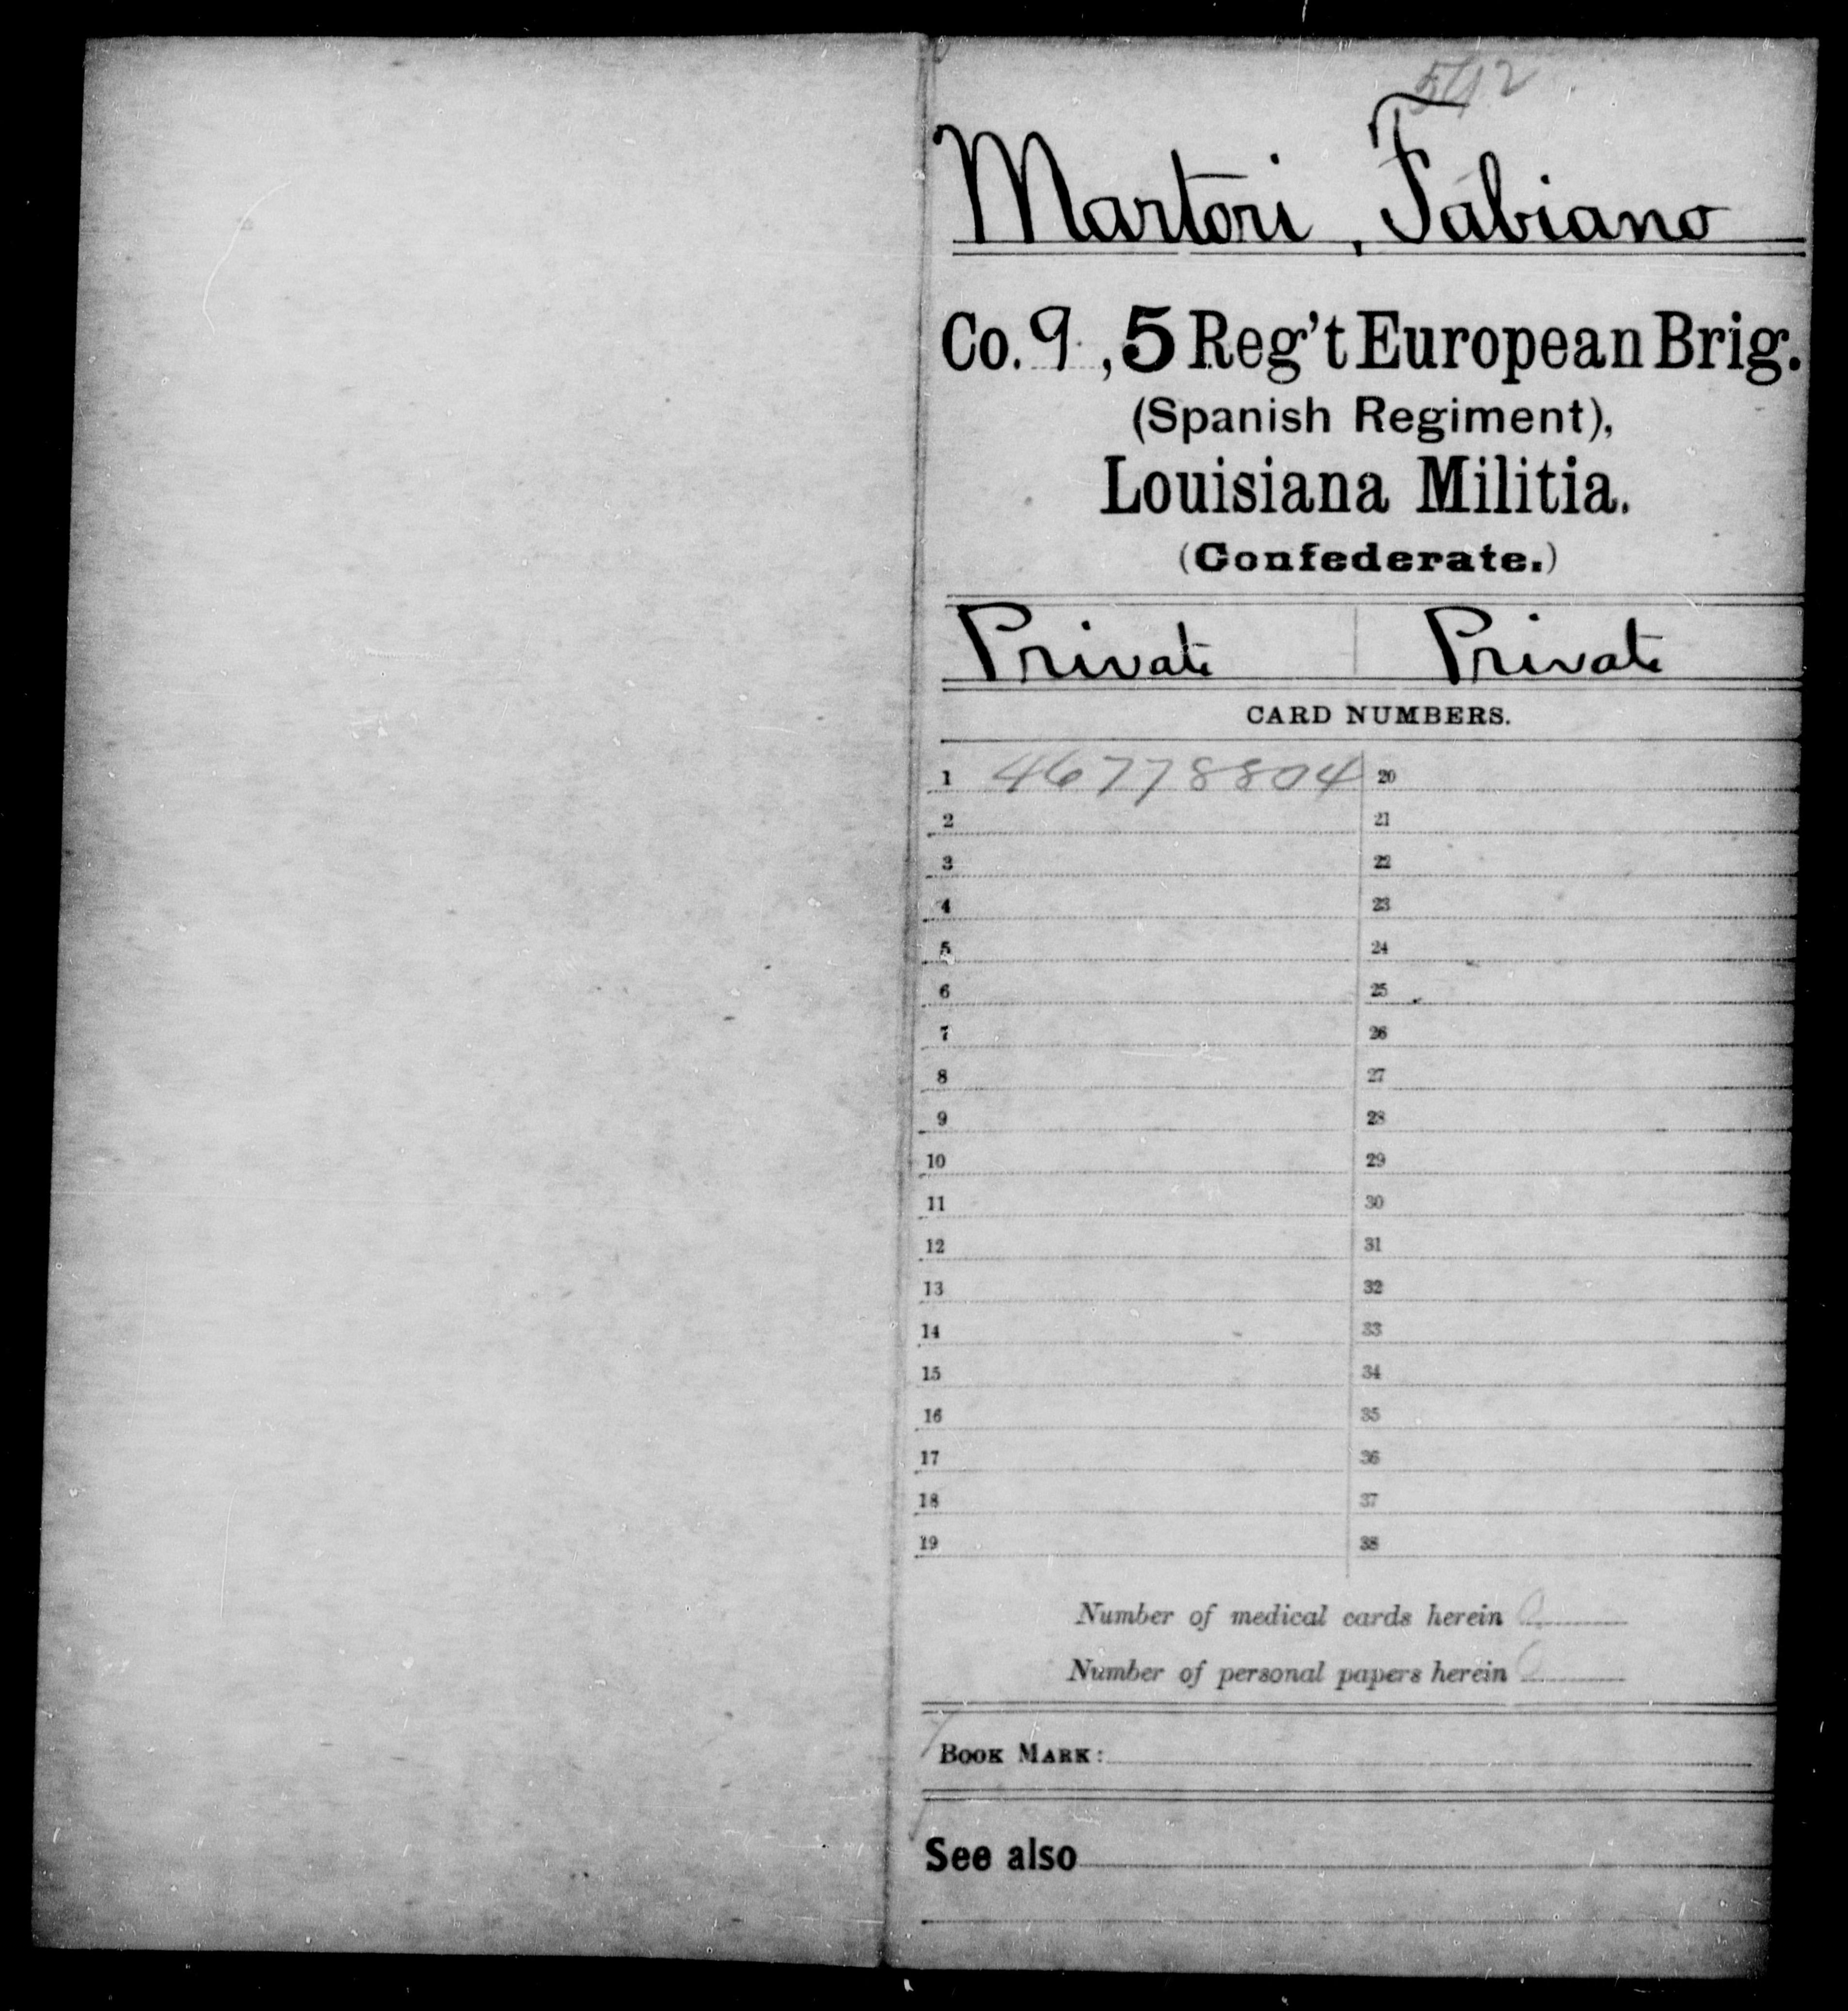 Confederate Soldiers from the State of Louisiana - Martori, Fabiano - Fifth Regiment, European Brigade (Spanish Regiment)